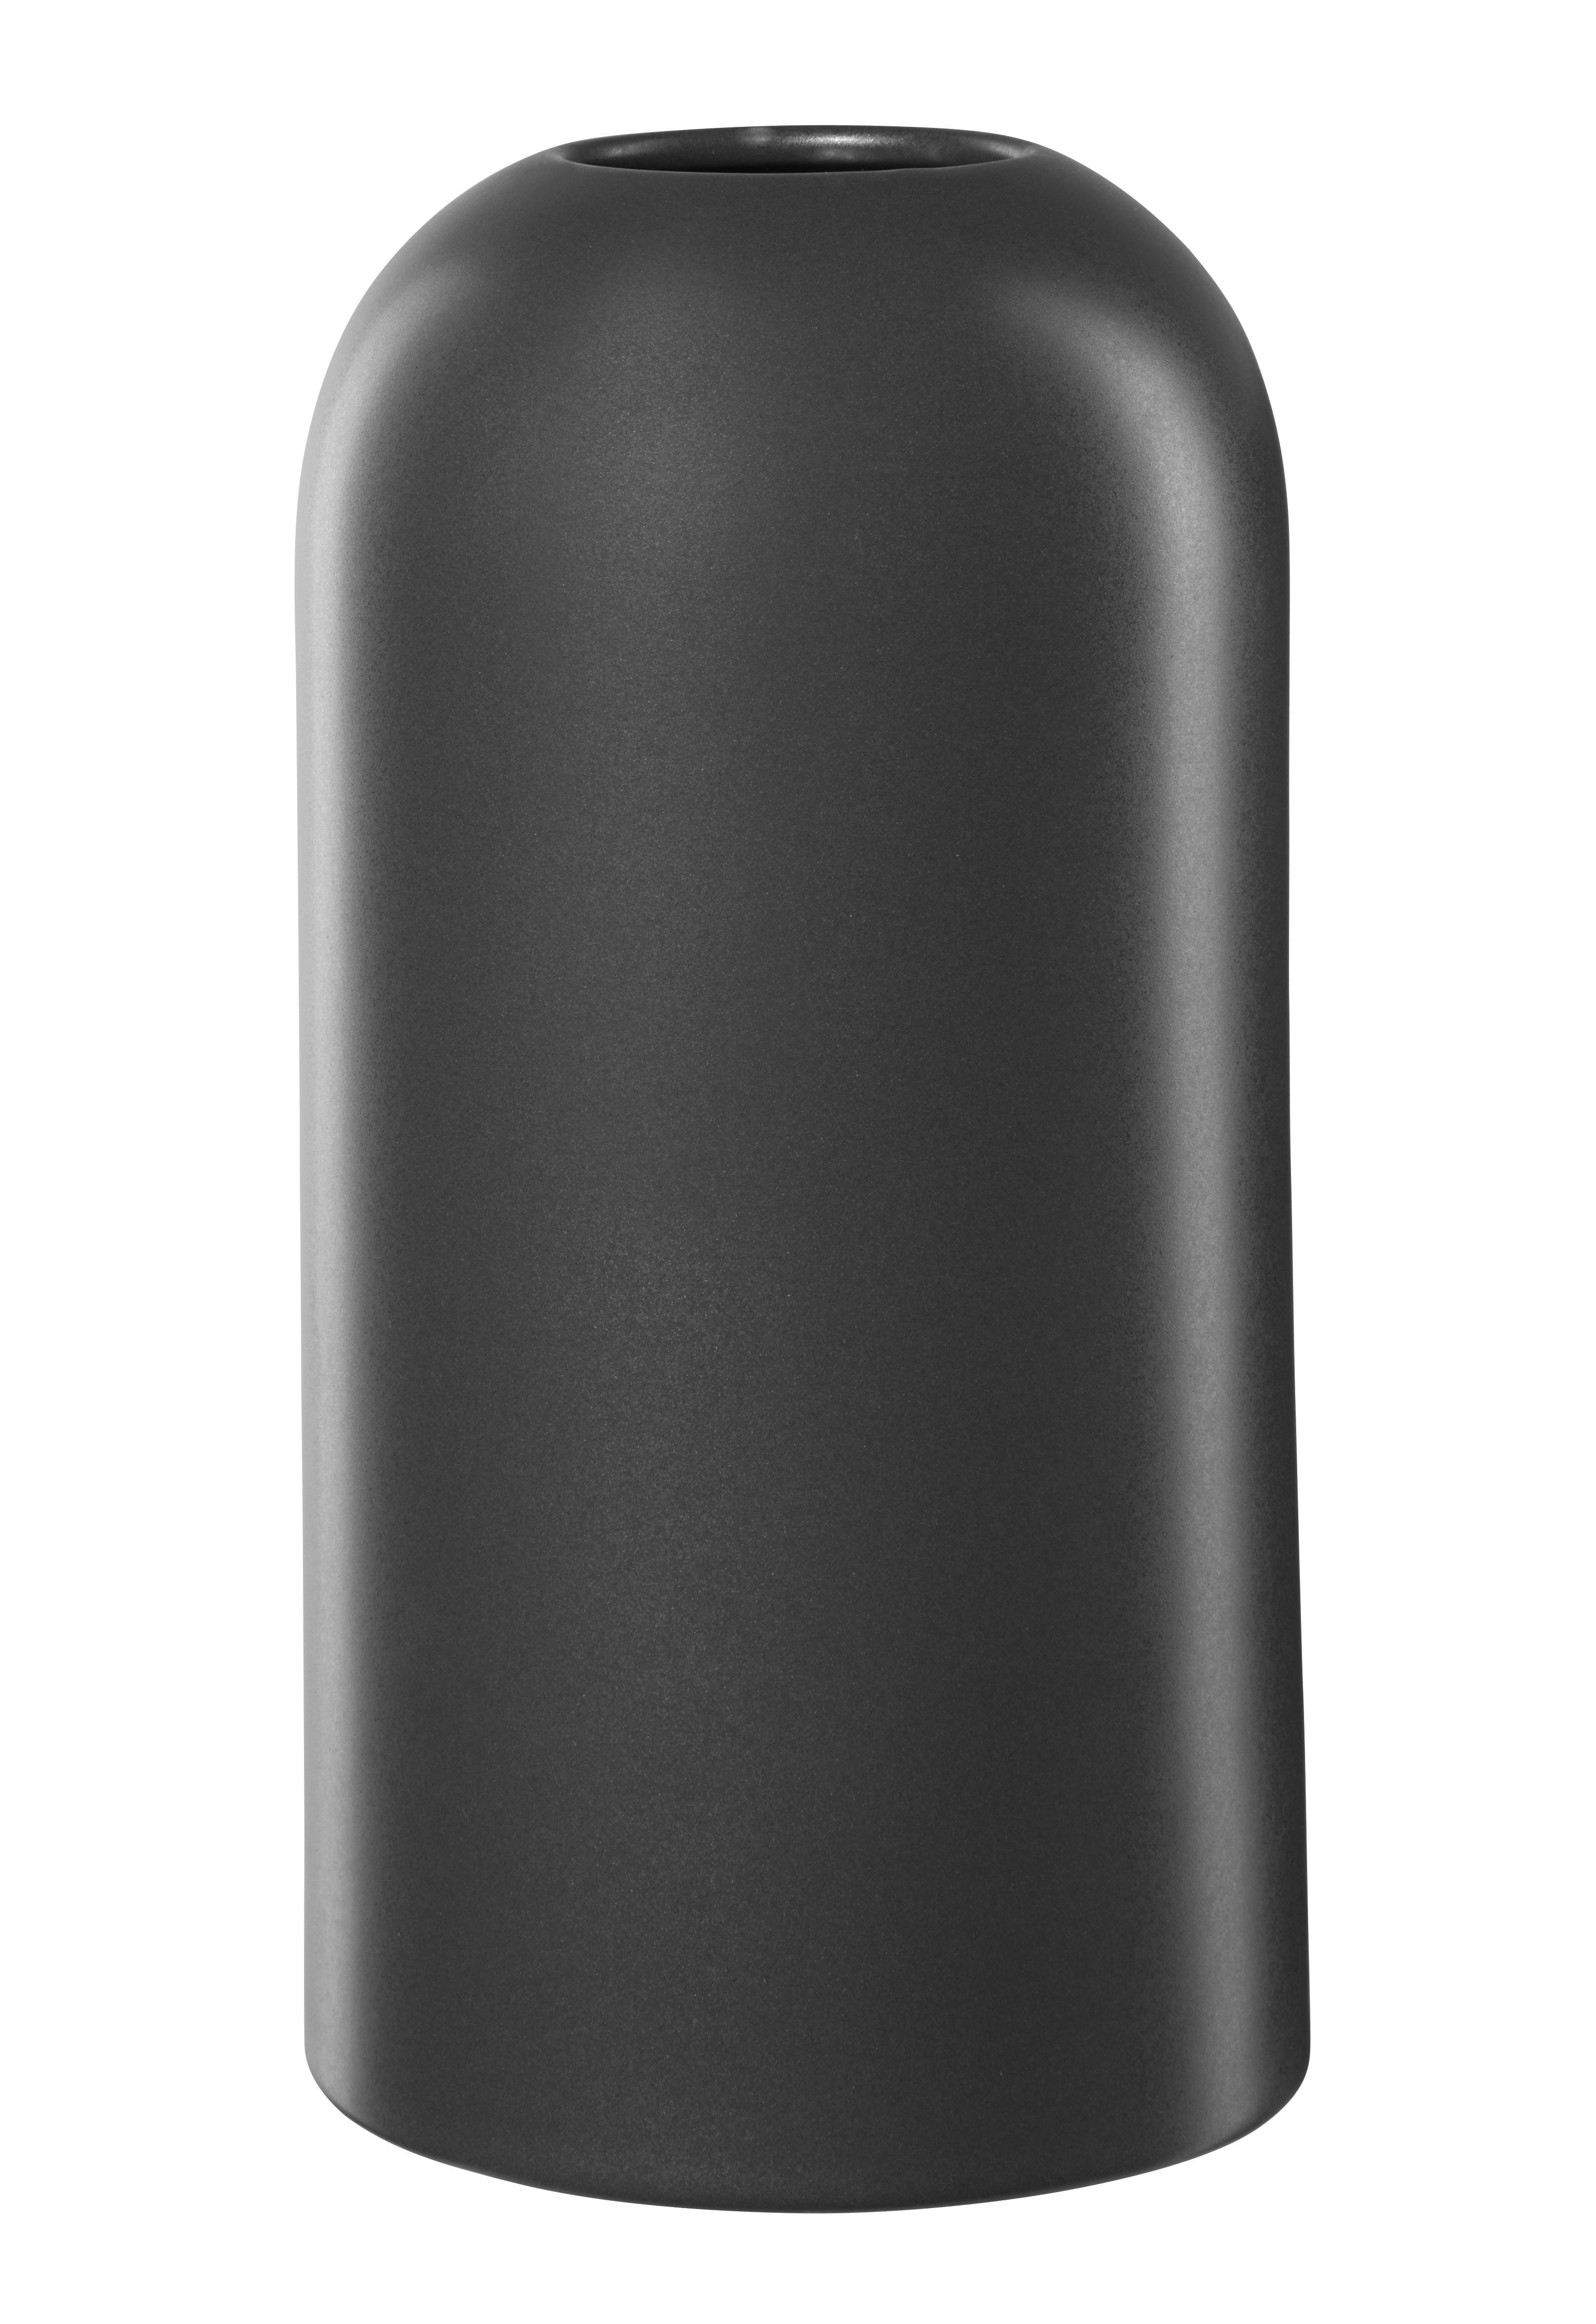 vase dunkelgrau vasen wohnaccessoires produkte. Black Bedroom Furniture Sets. Home Design Ideas